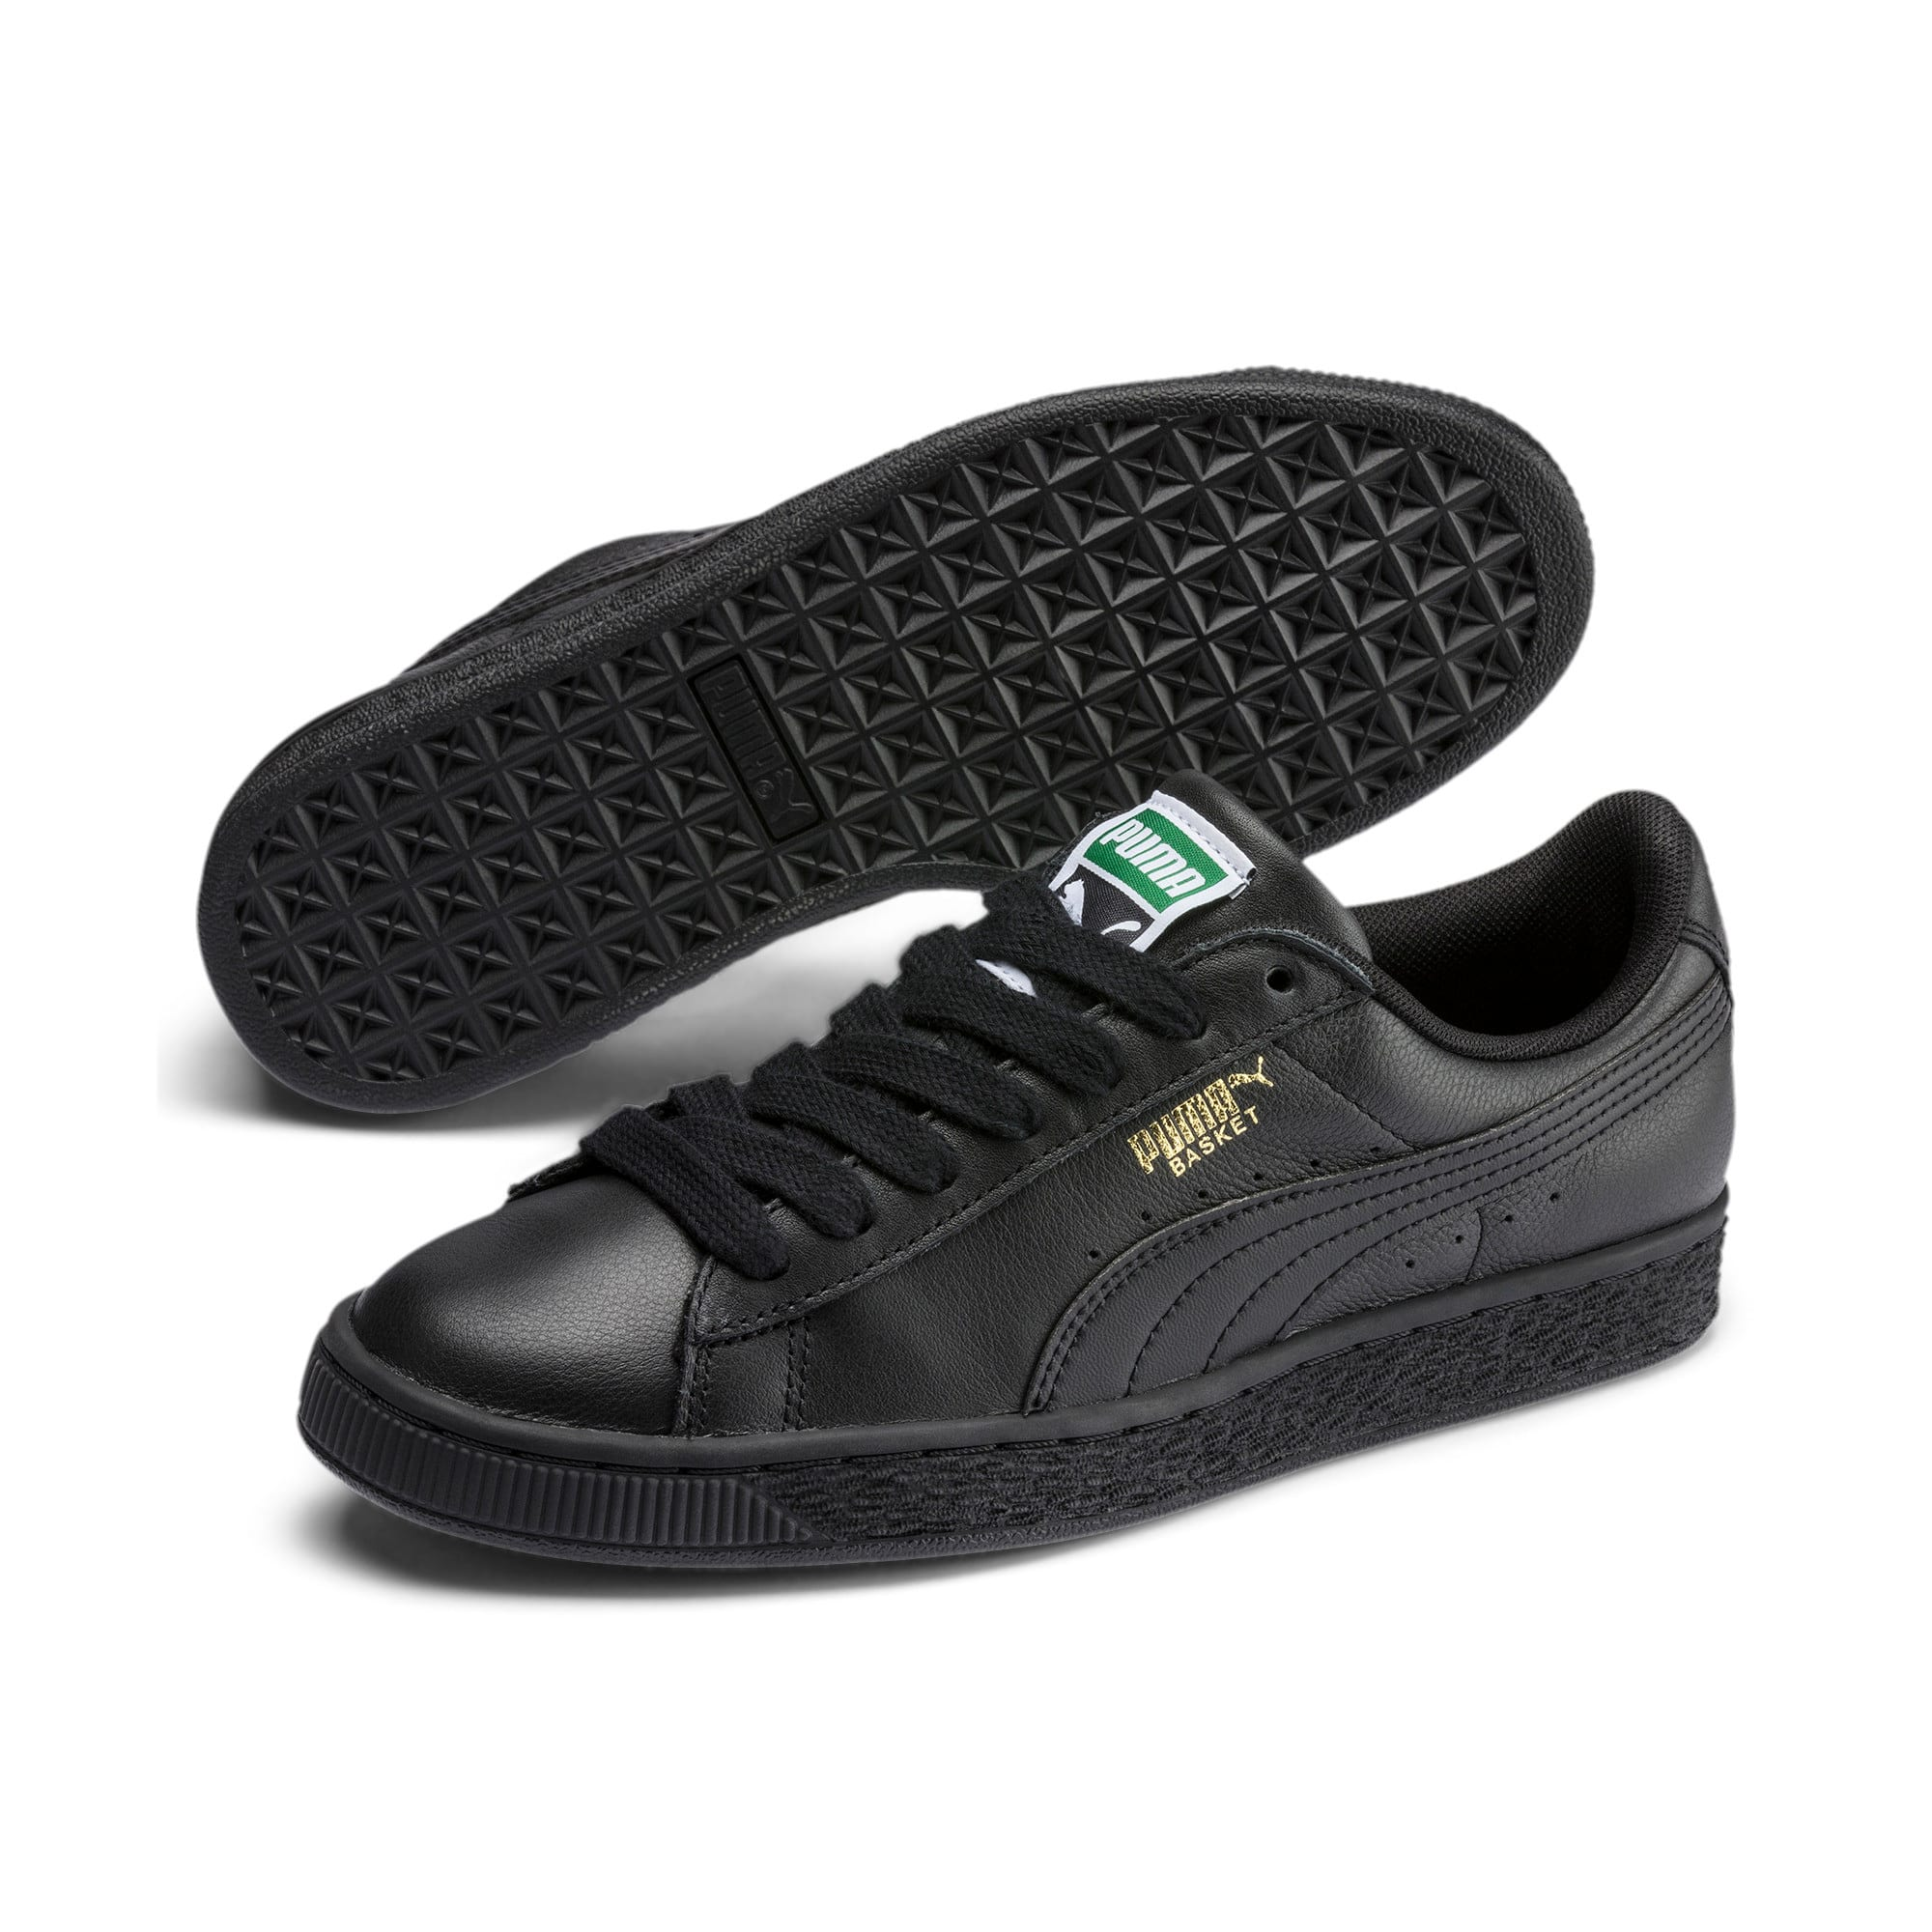 Thumbnail 2 of Basket Classic LFS Men's Shoes, black-team gold, medium